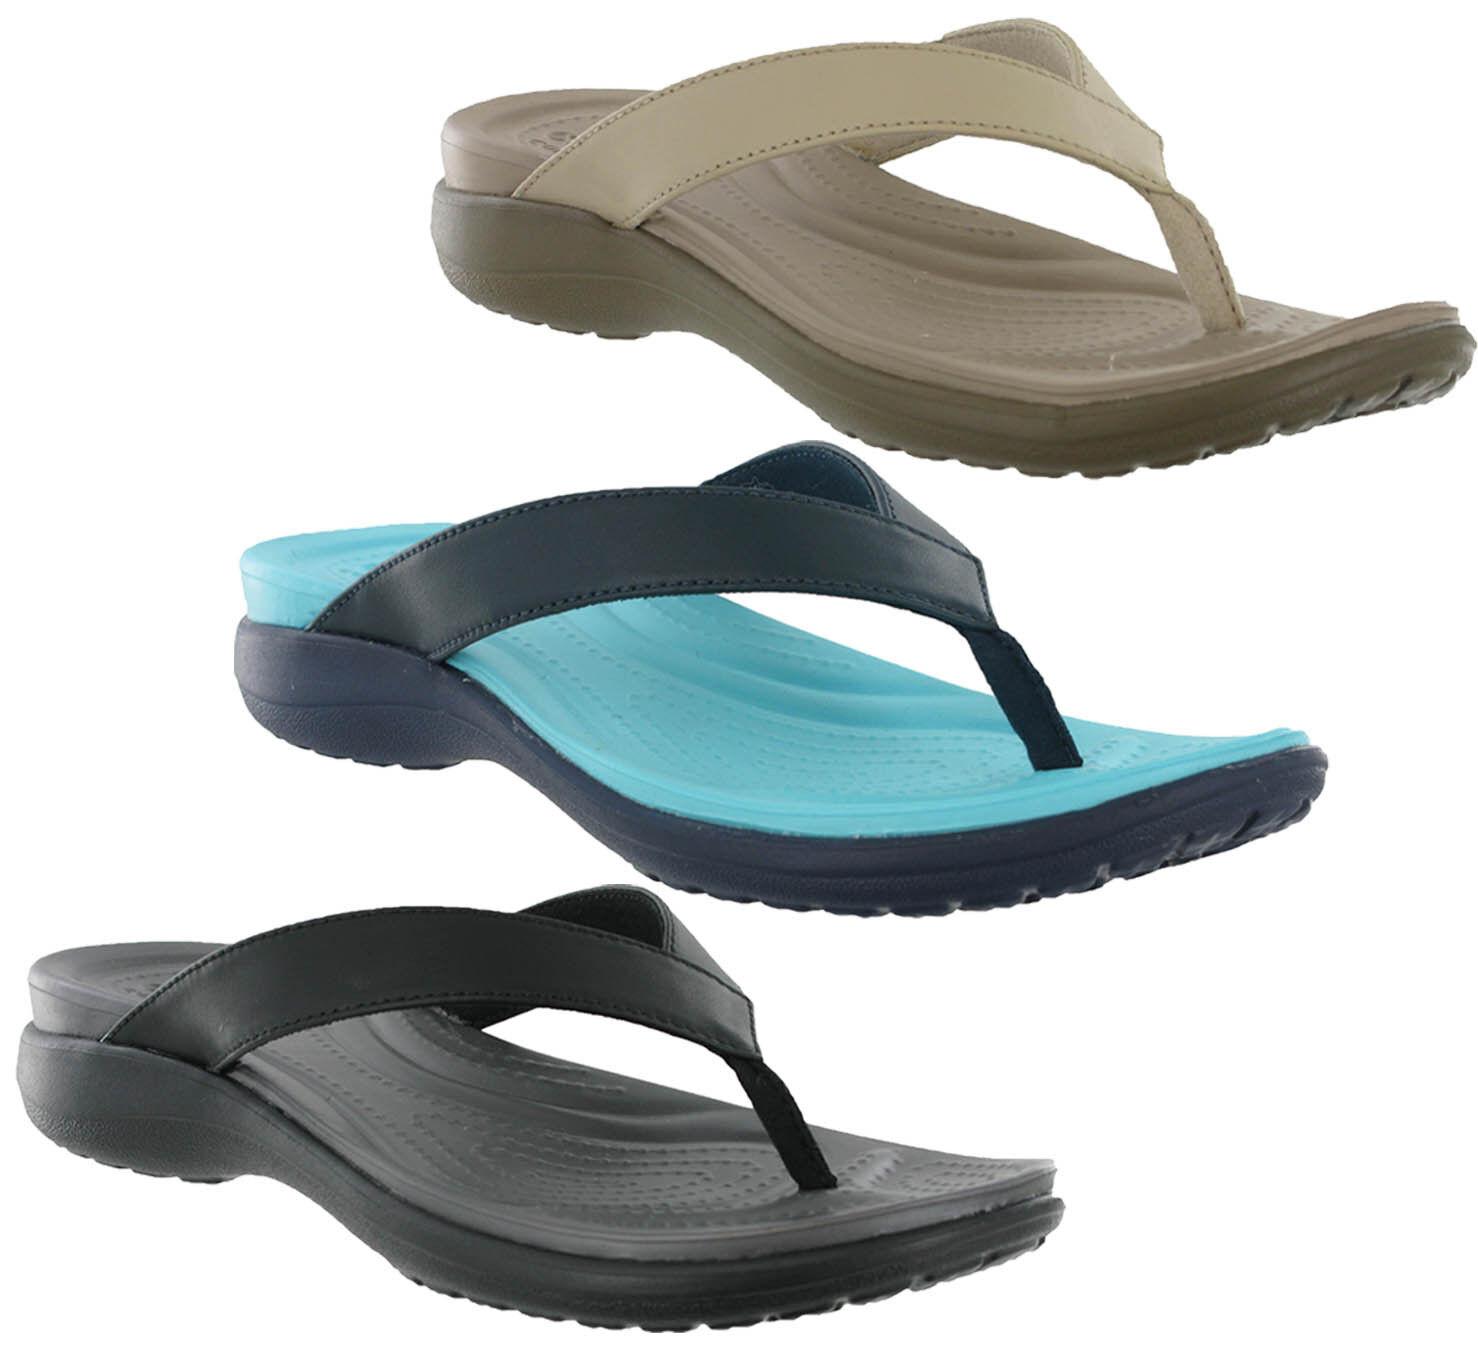 477d910621c4 Crocs Capri V Flip Comfort Walking Leather Slip On Toe Post Womens Sandals  UK4-9